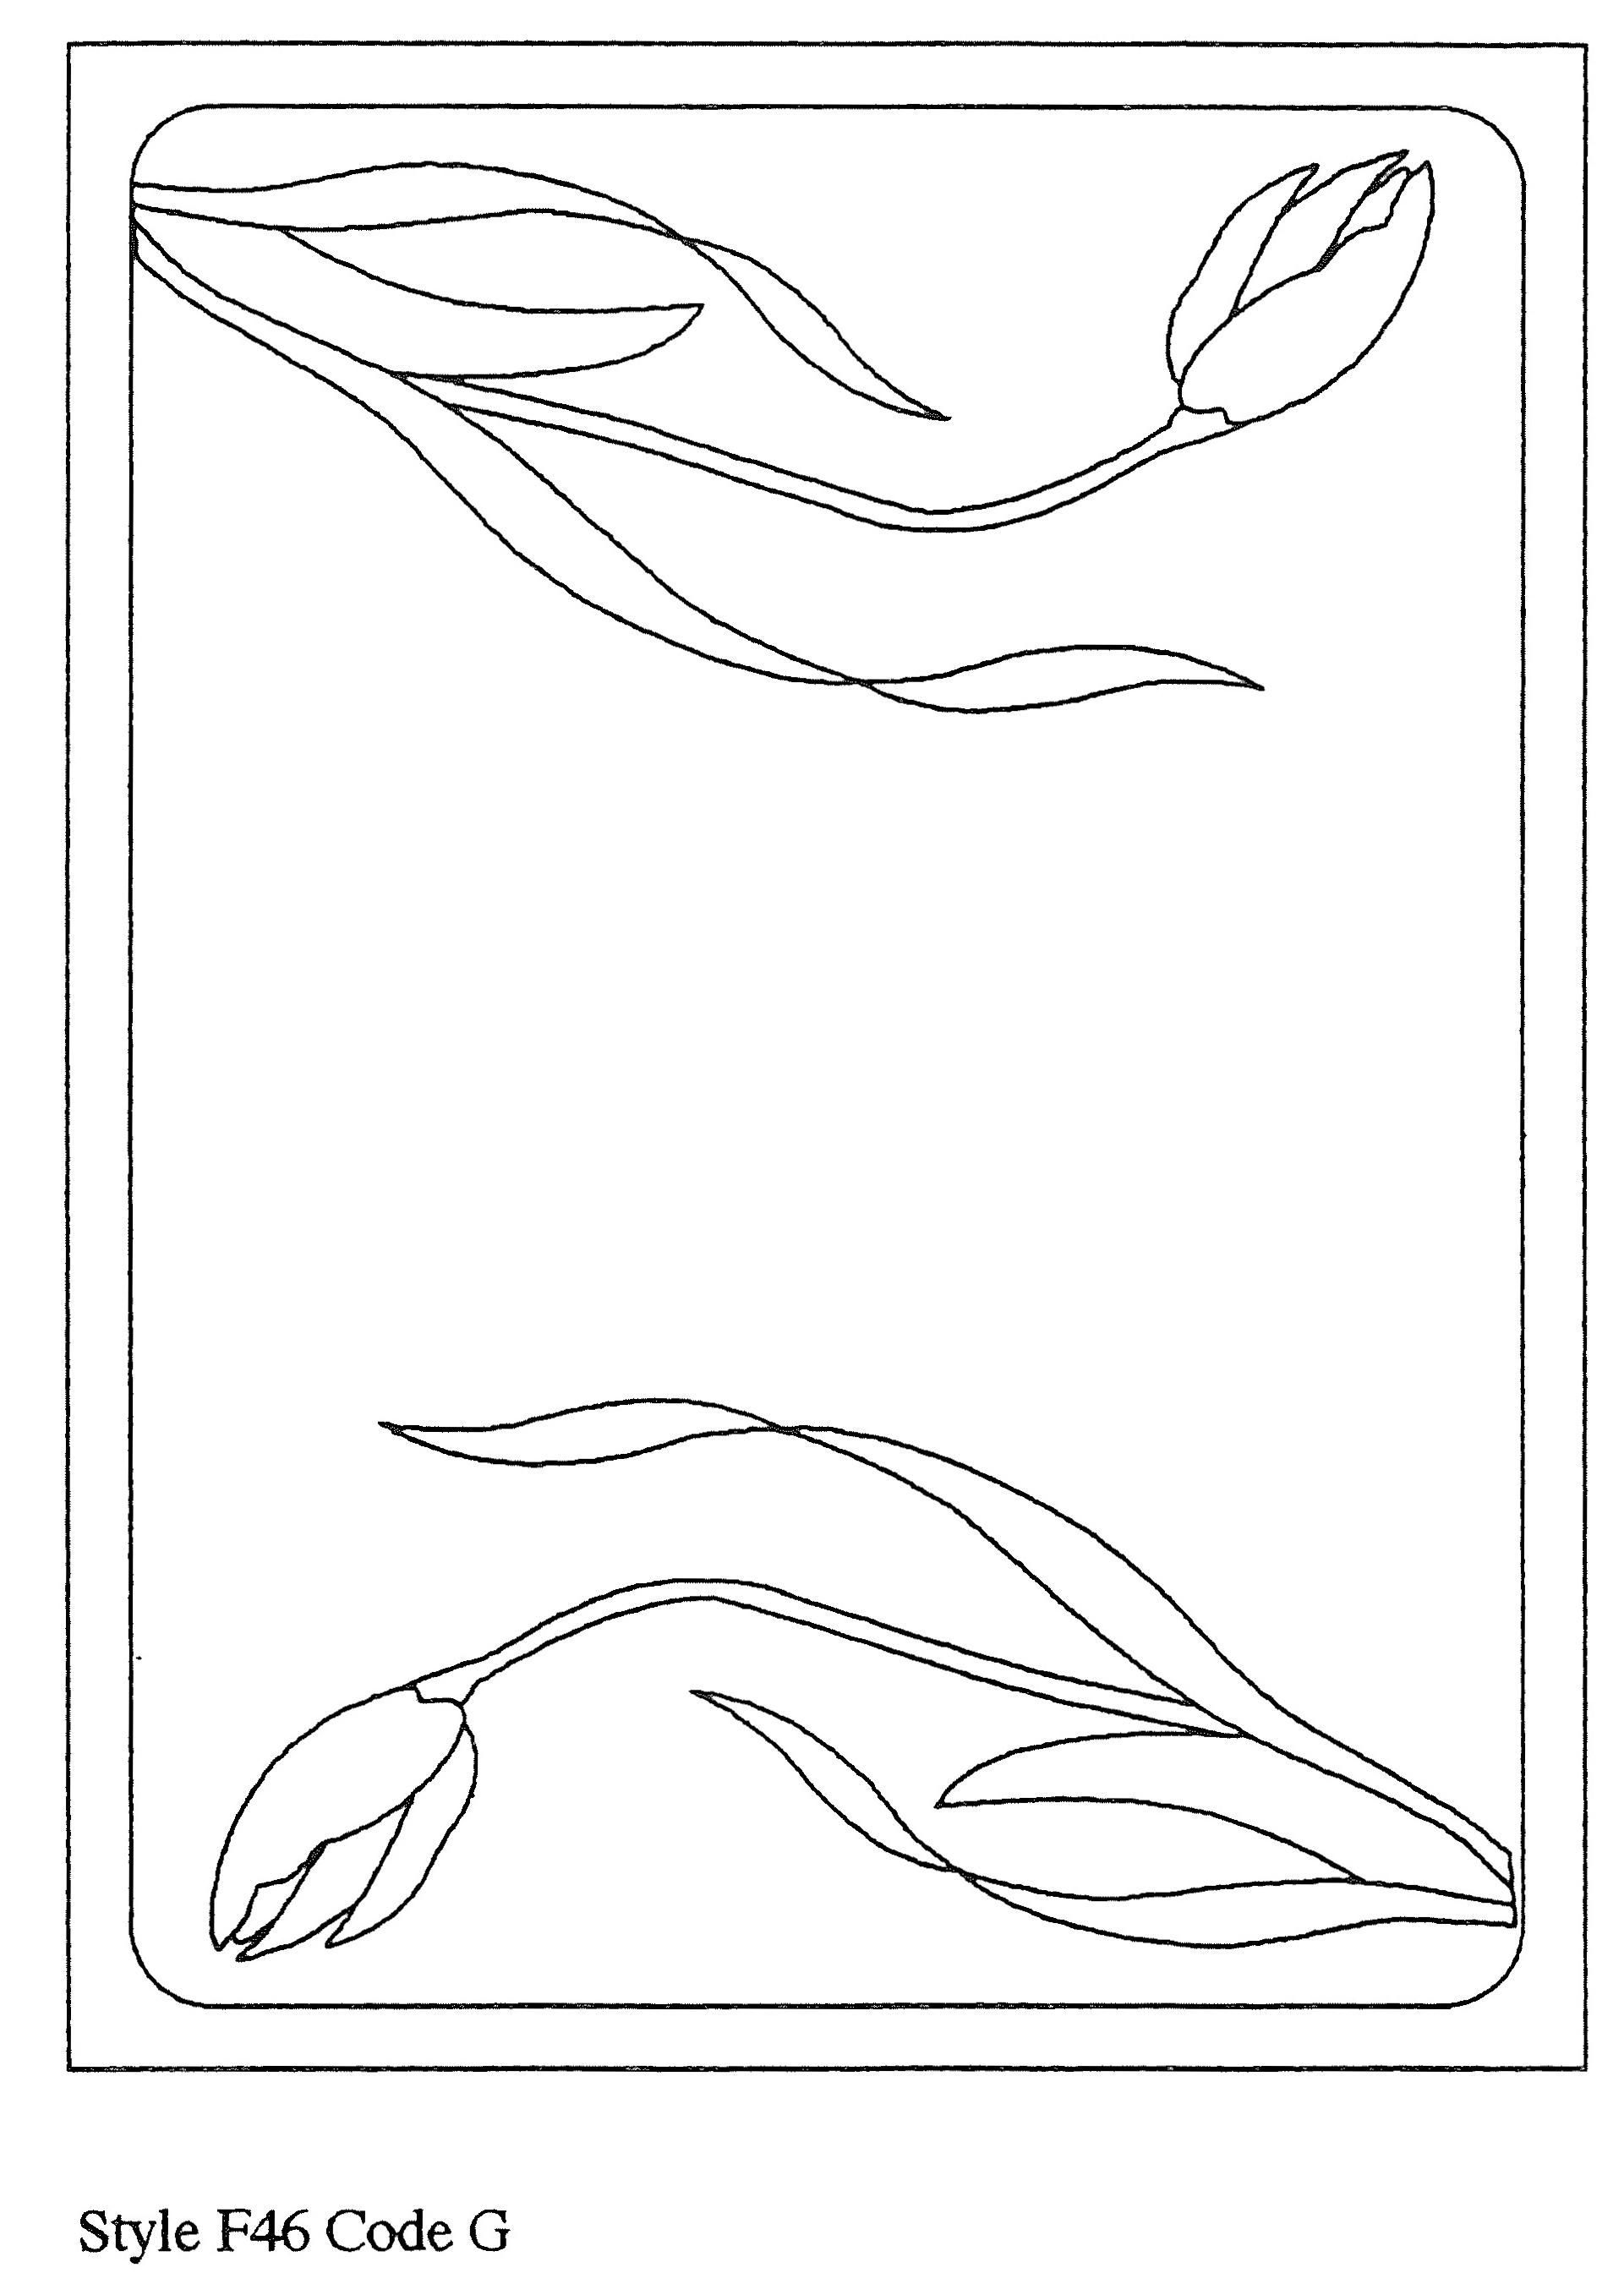 Page 24 copy 3.jpg